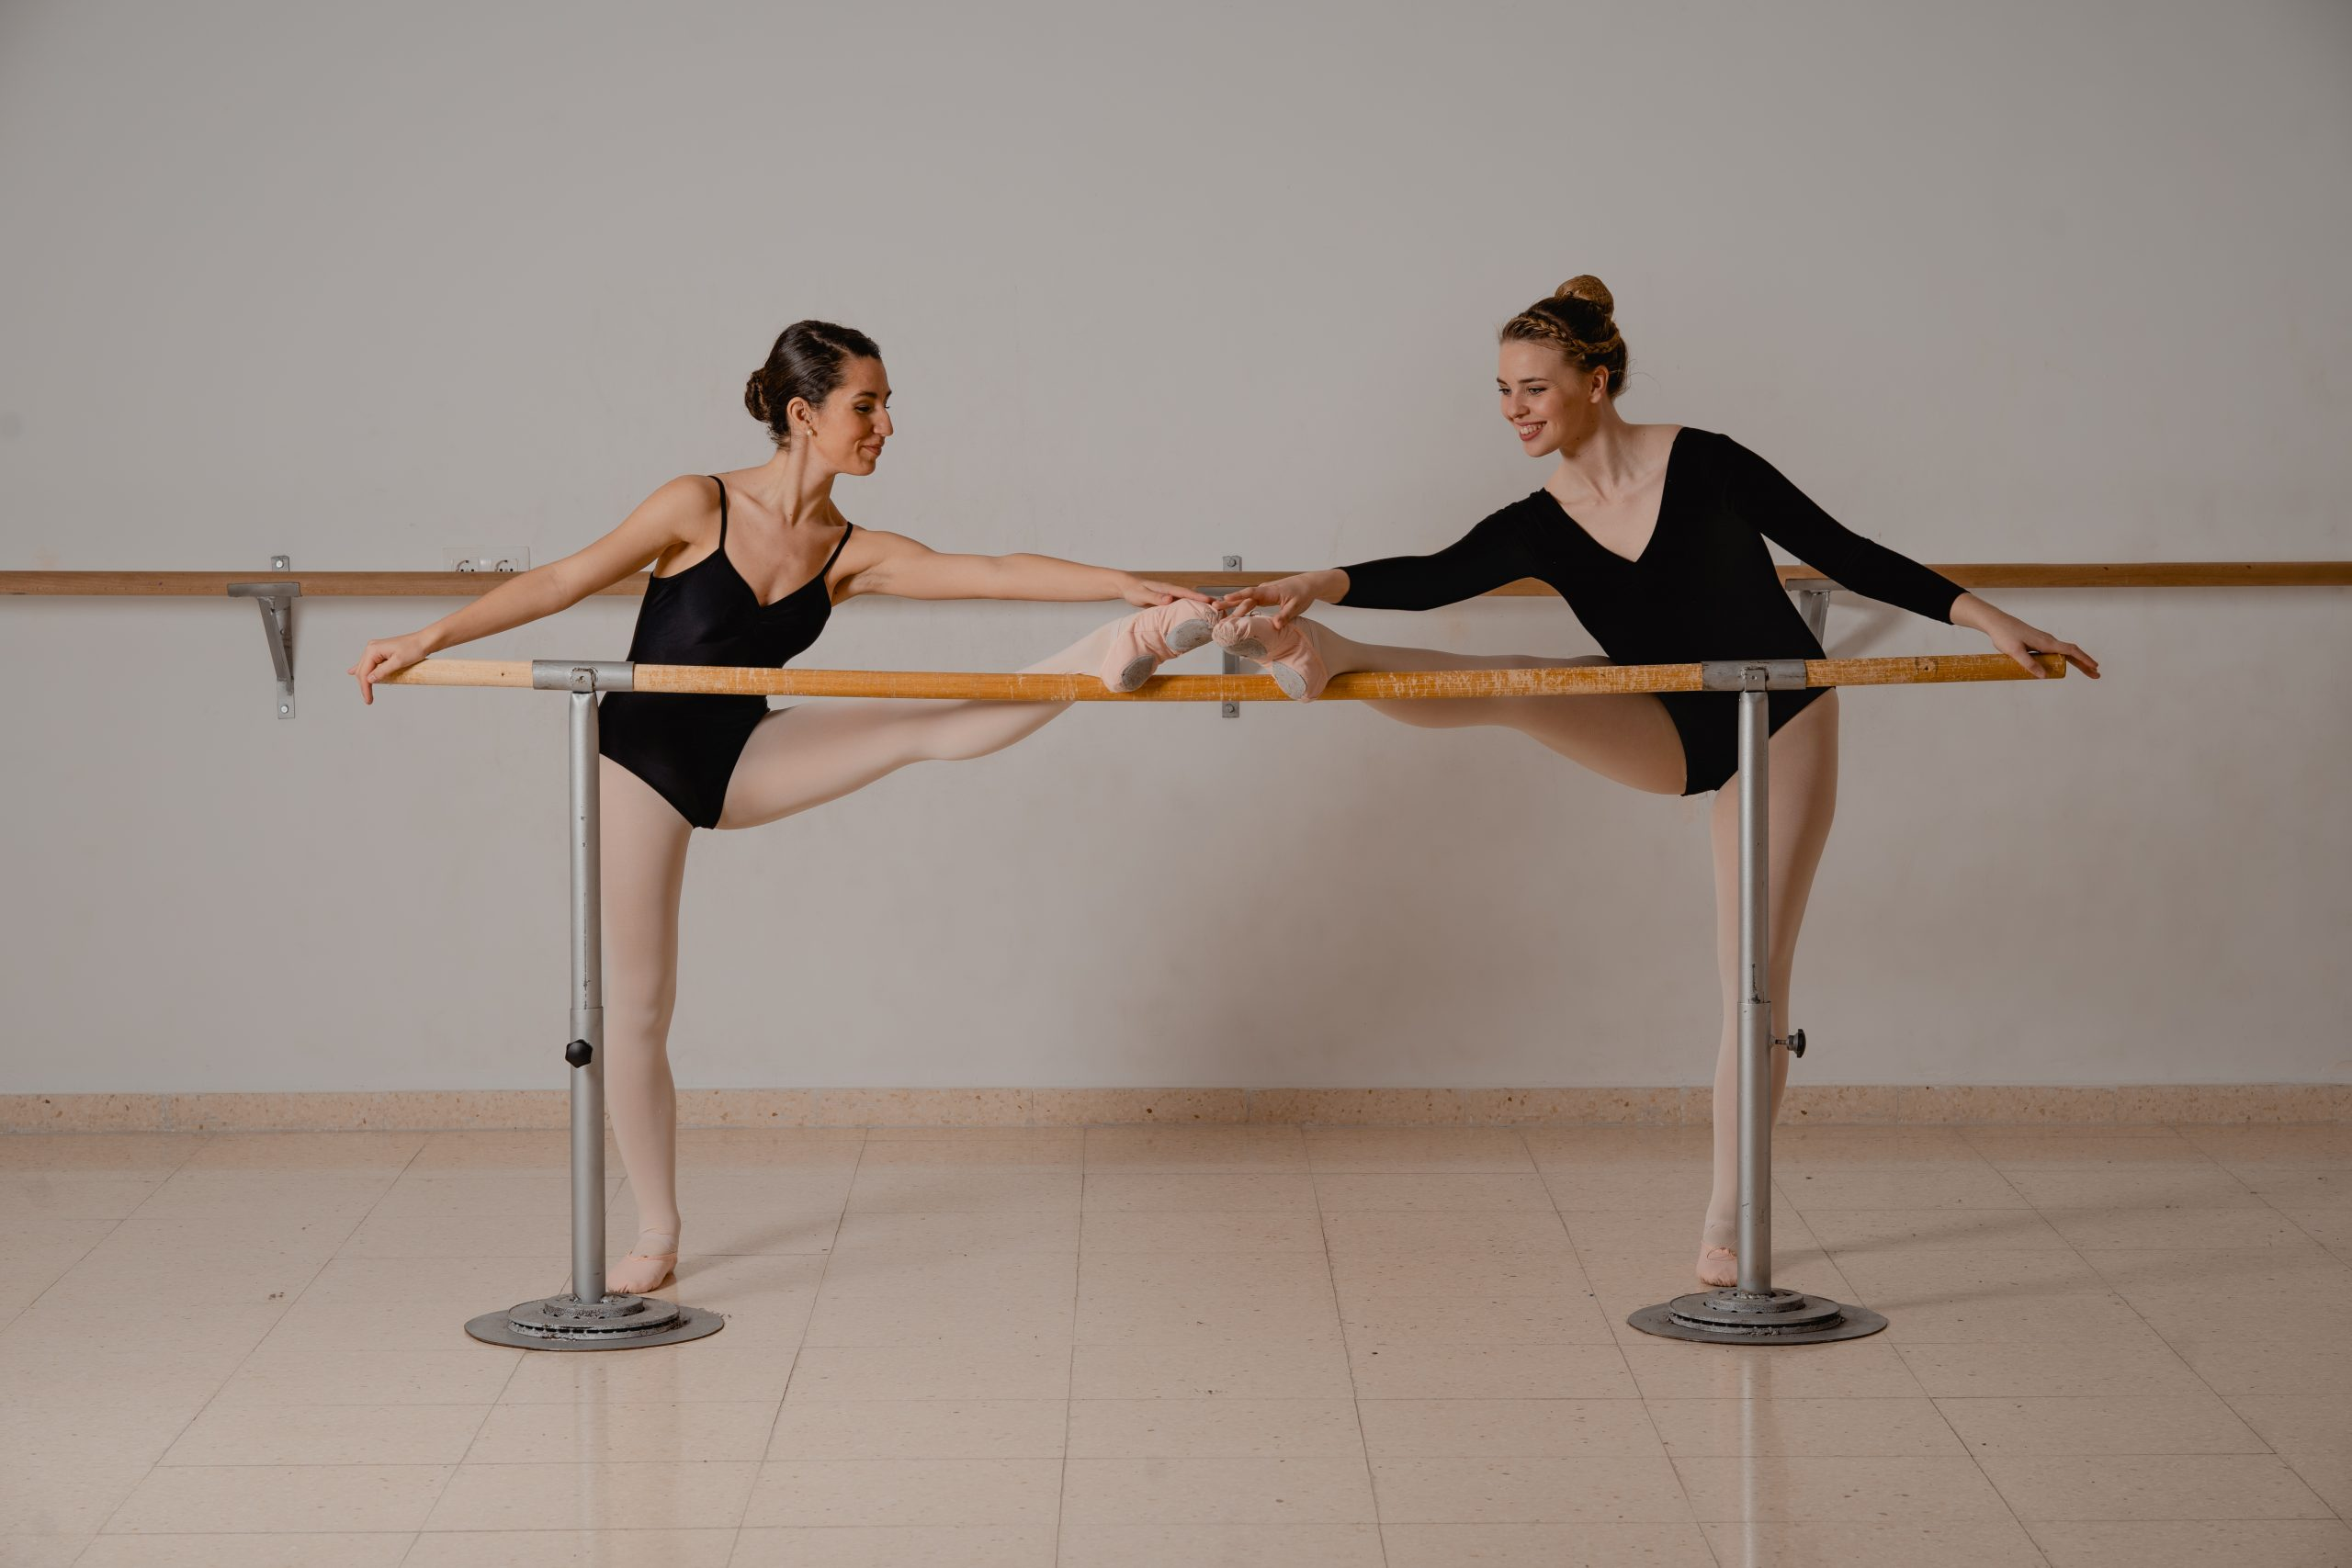 Venta Online Leotardos Ballet Low Cost